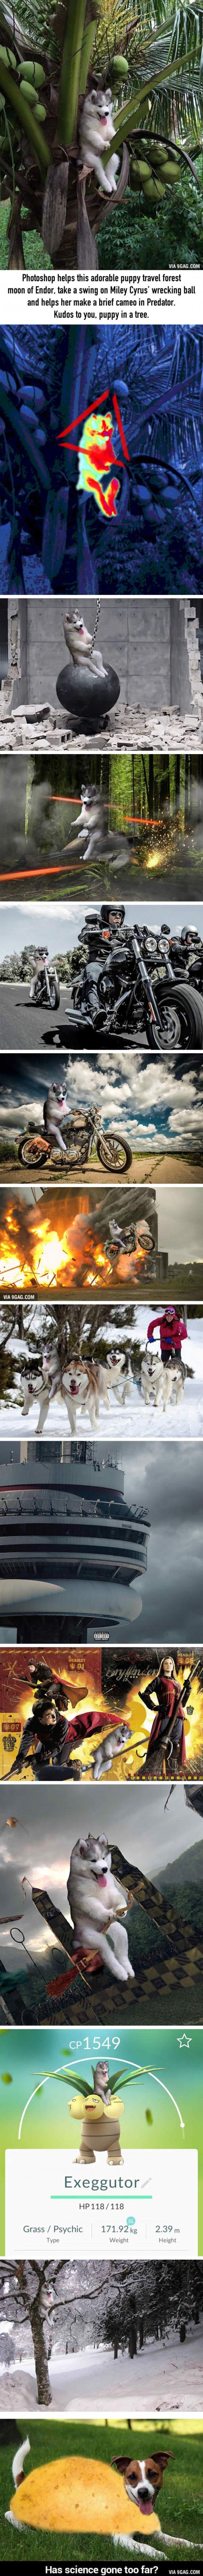 Photoshop Husky